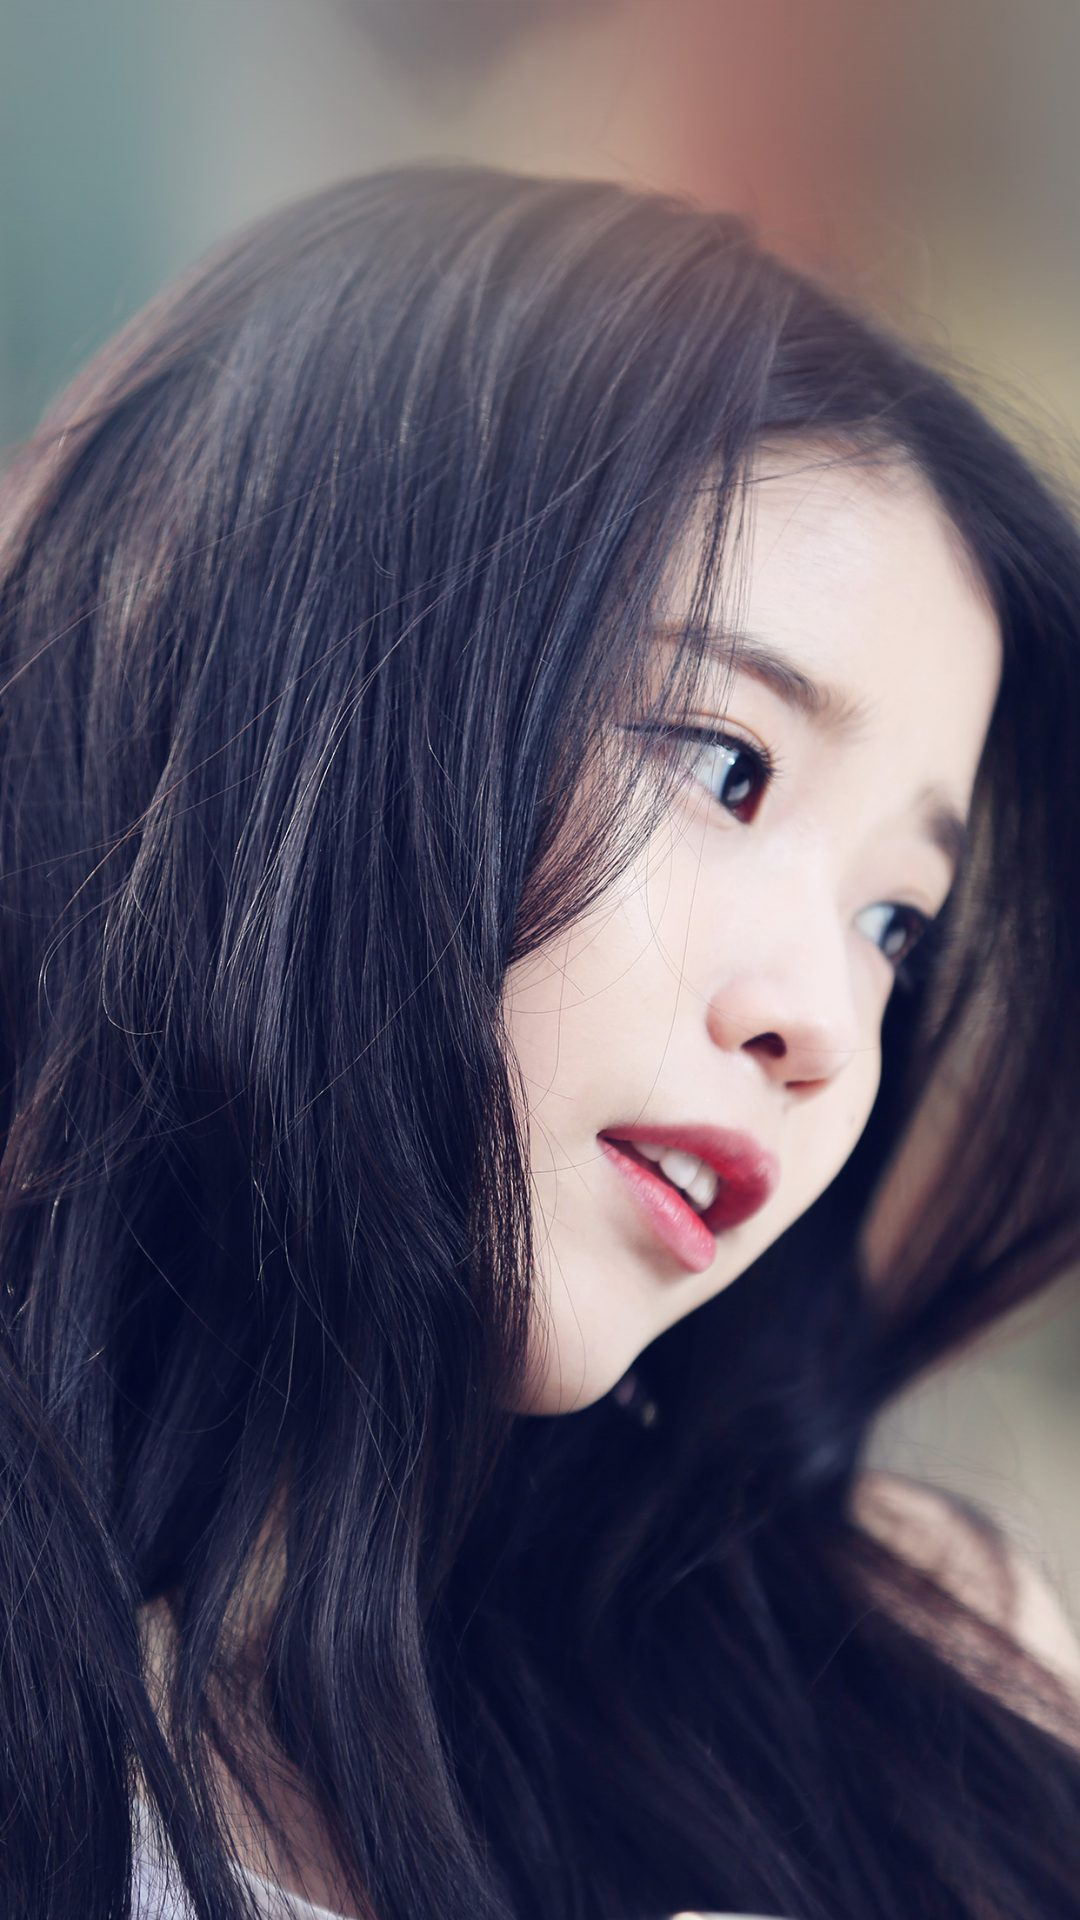 Iu Kpop Beauty Girl Singer